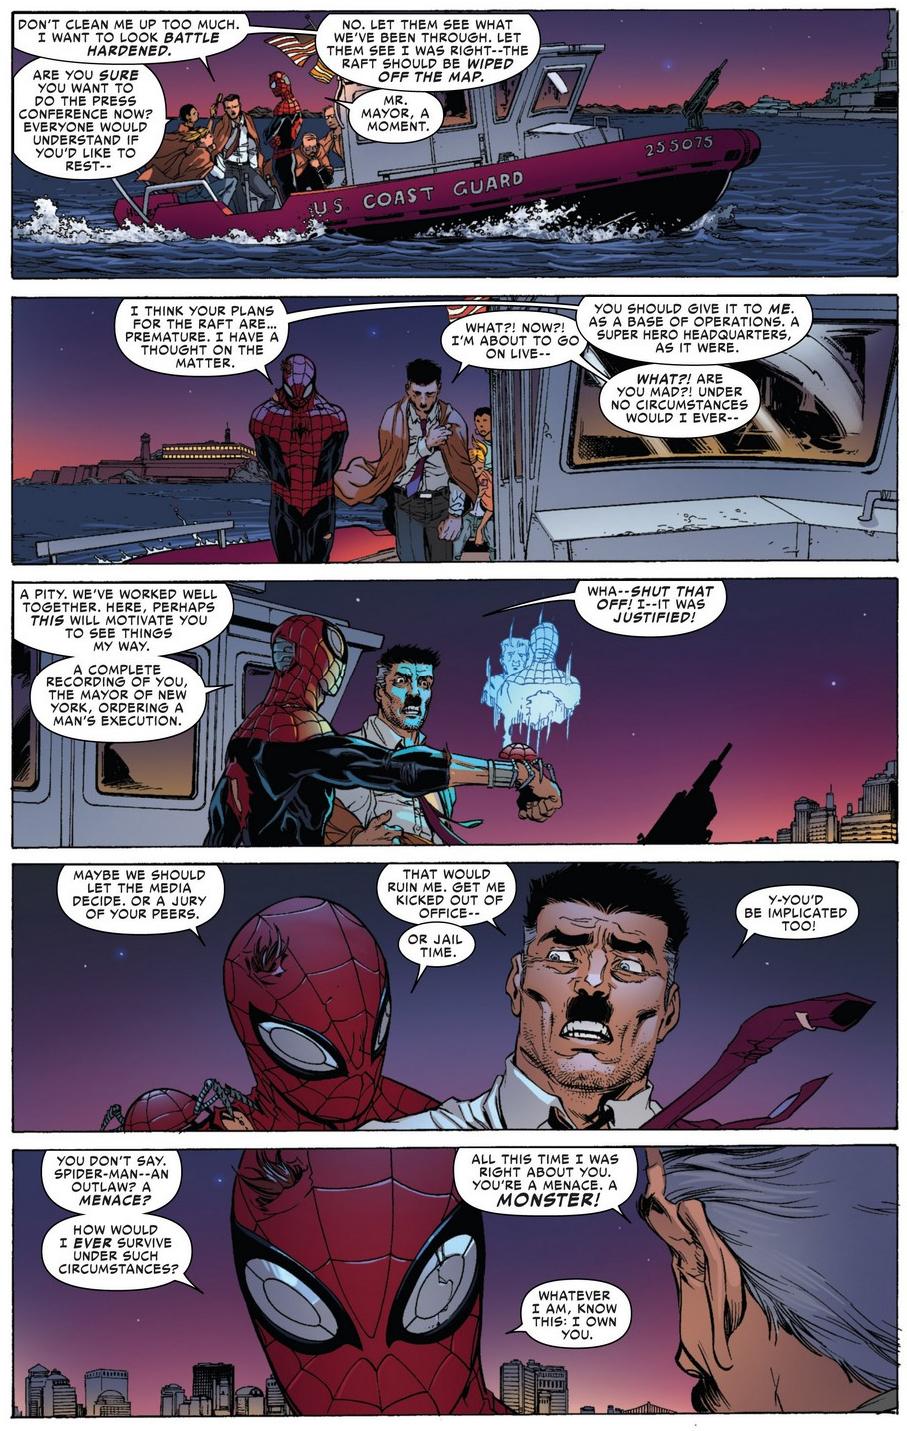 Jonah jameson quotes quotesgram - Superior Spider Man Blackmails Jonah Jameson